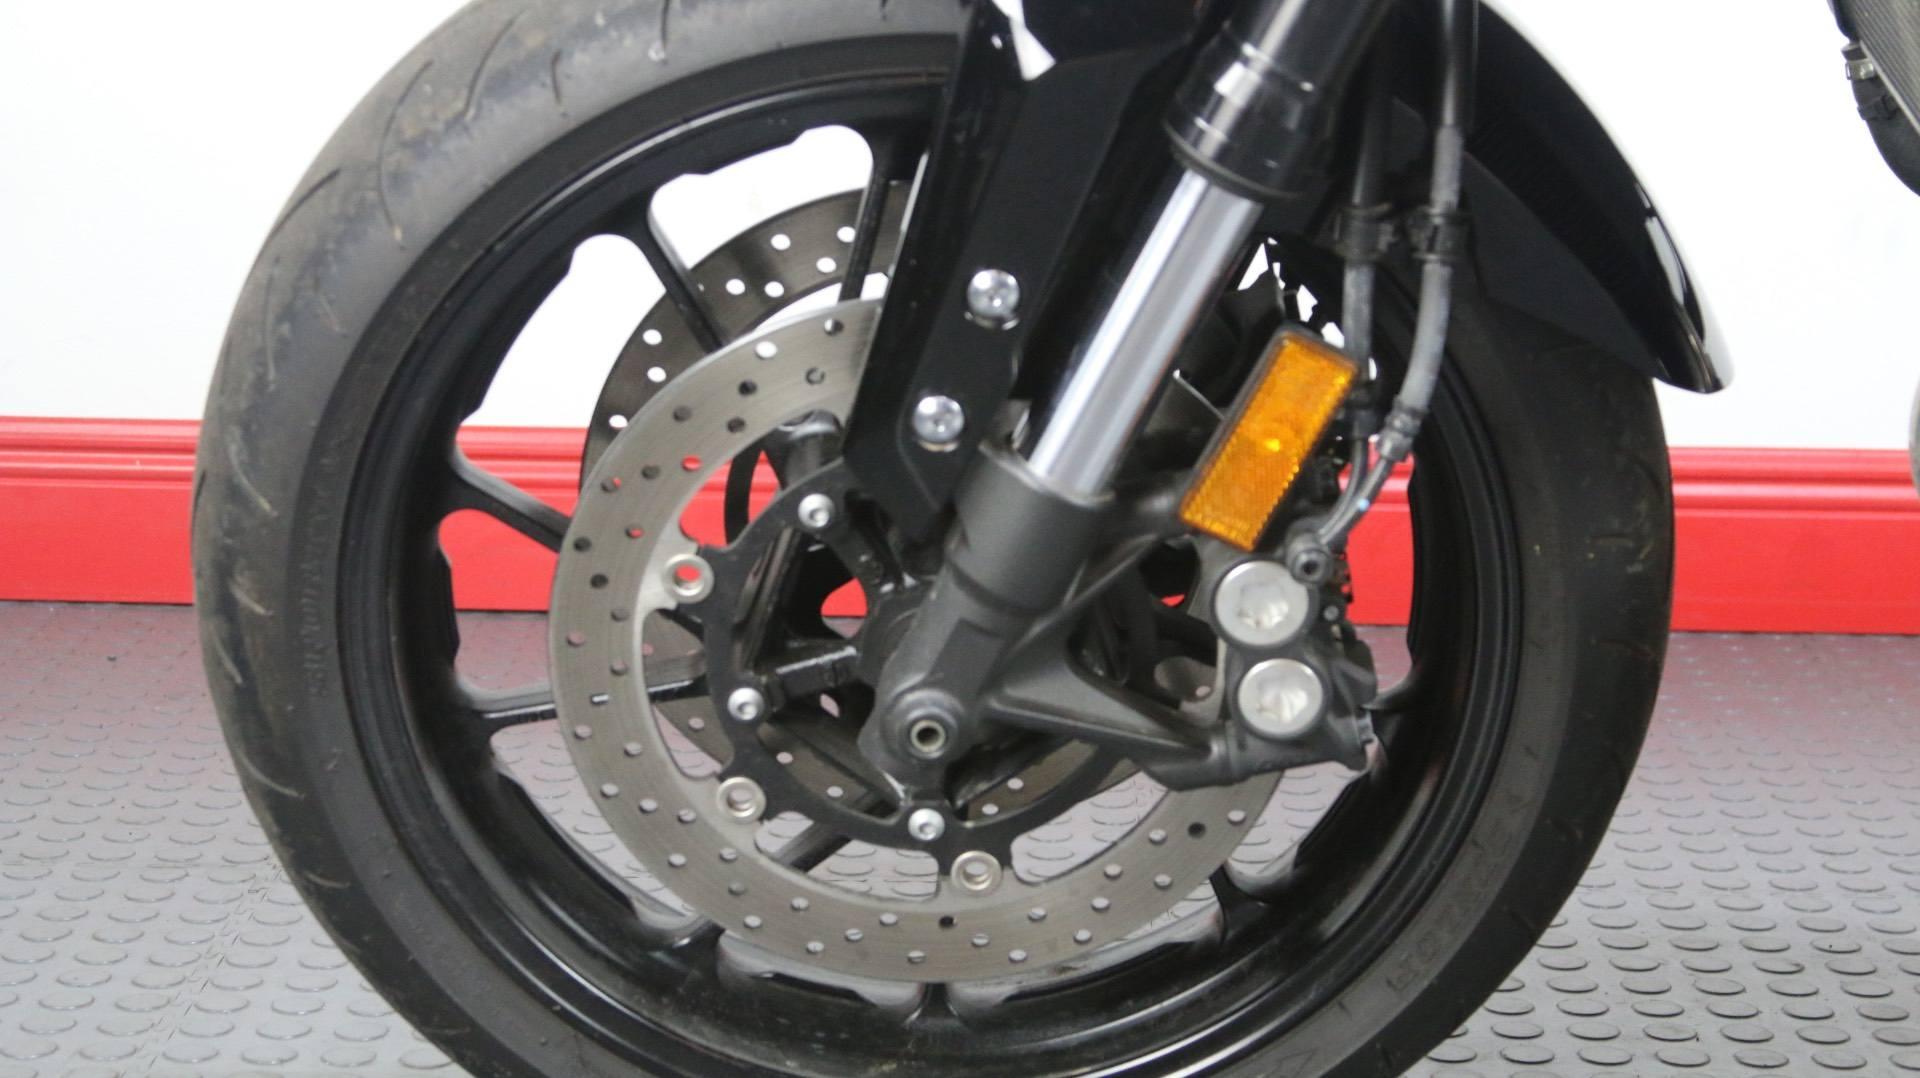 2016 Yamaha FZ-09 in Tampa, Florida